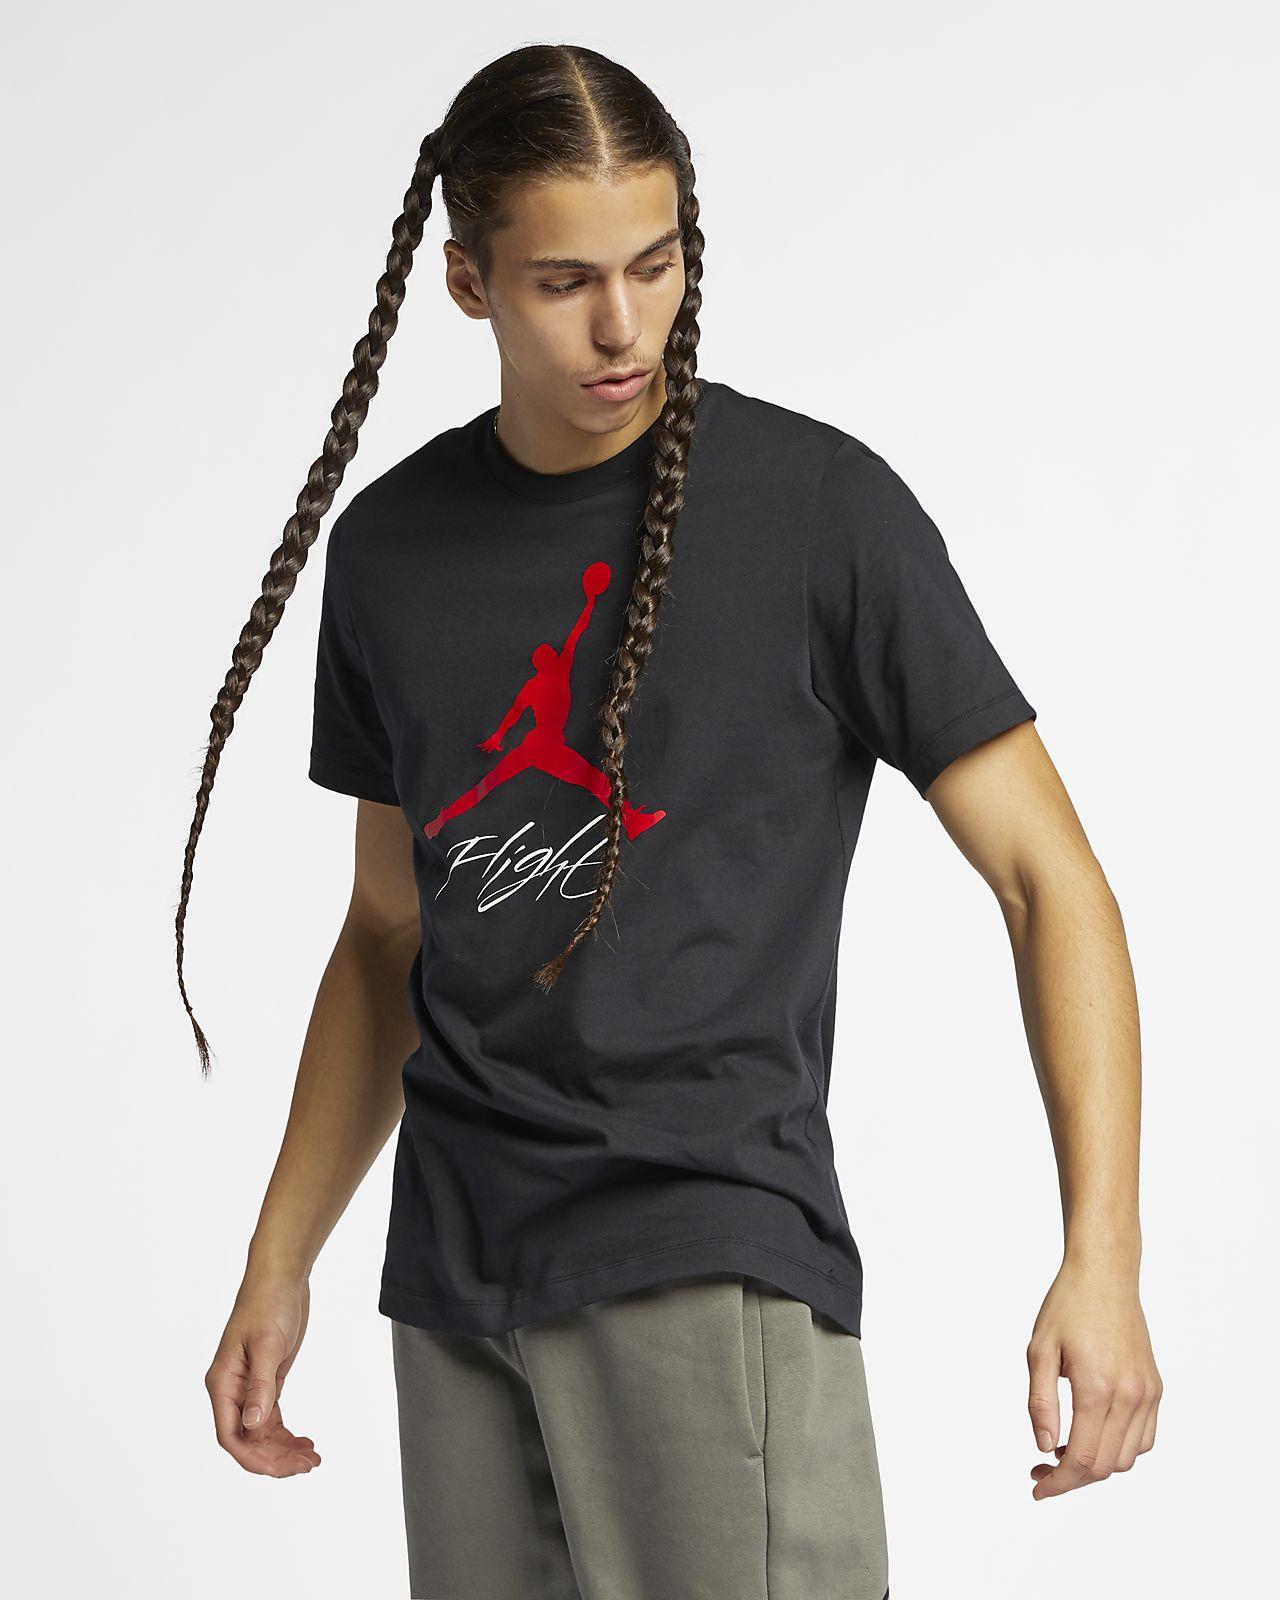 cbec4890e5dee2 Jordan Jumpman Flight Men s T-Shirt. Nike.com